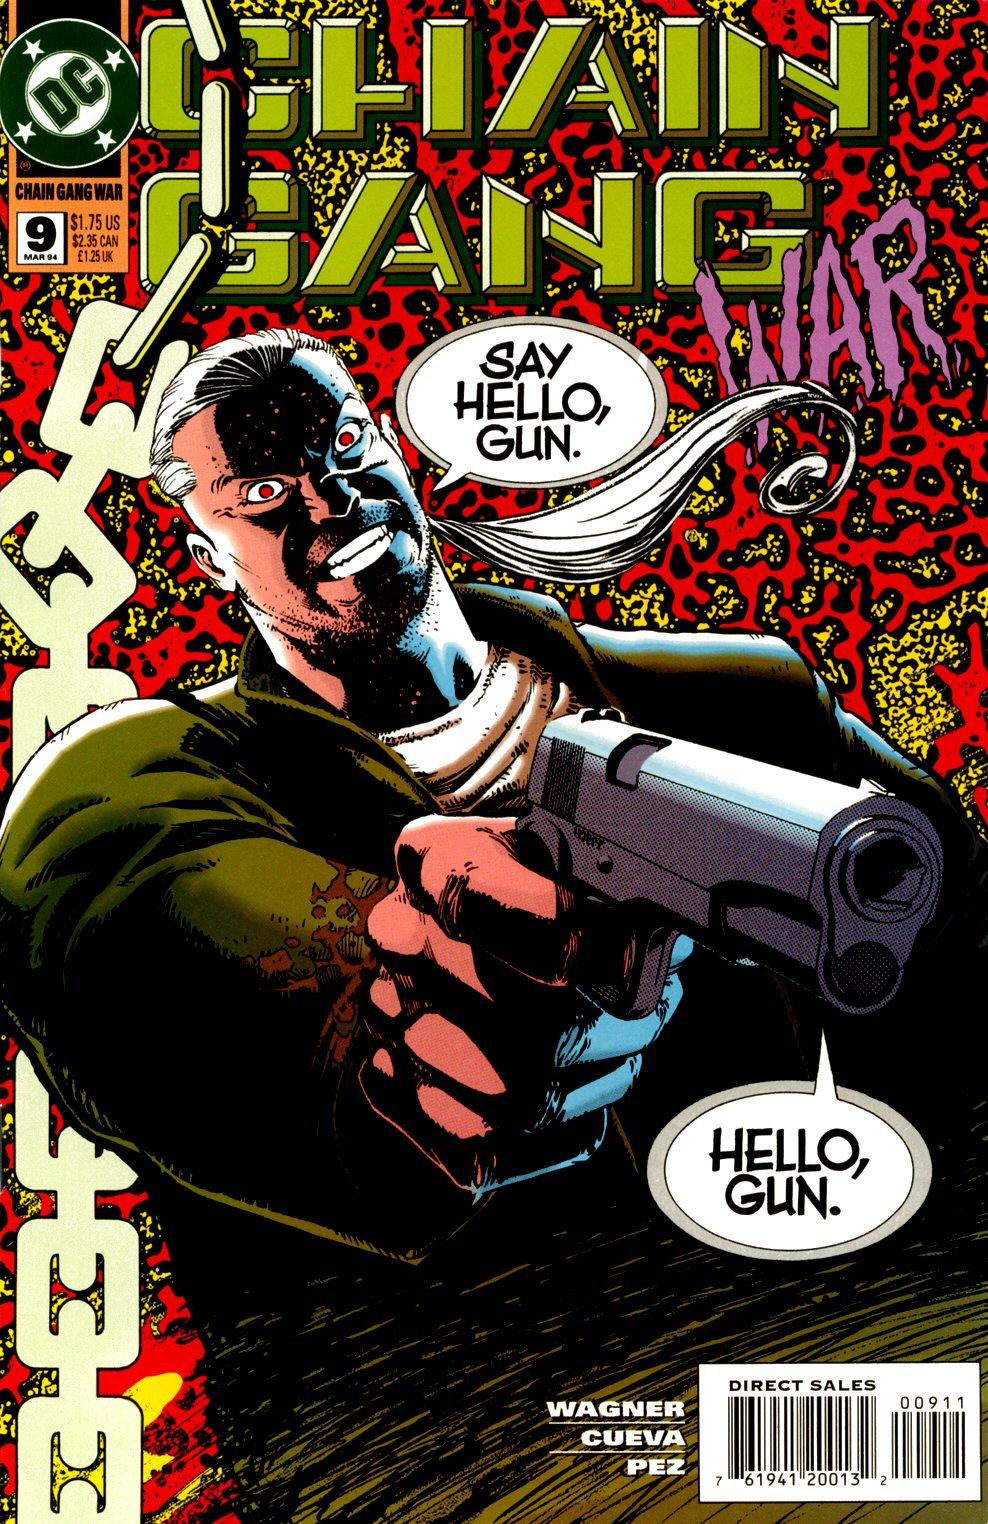 Chain Gang War 9 Page 1